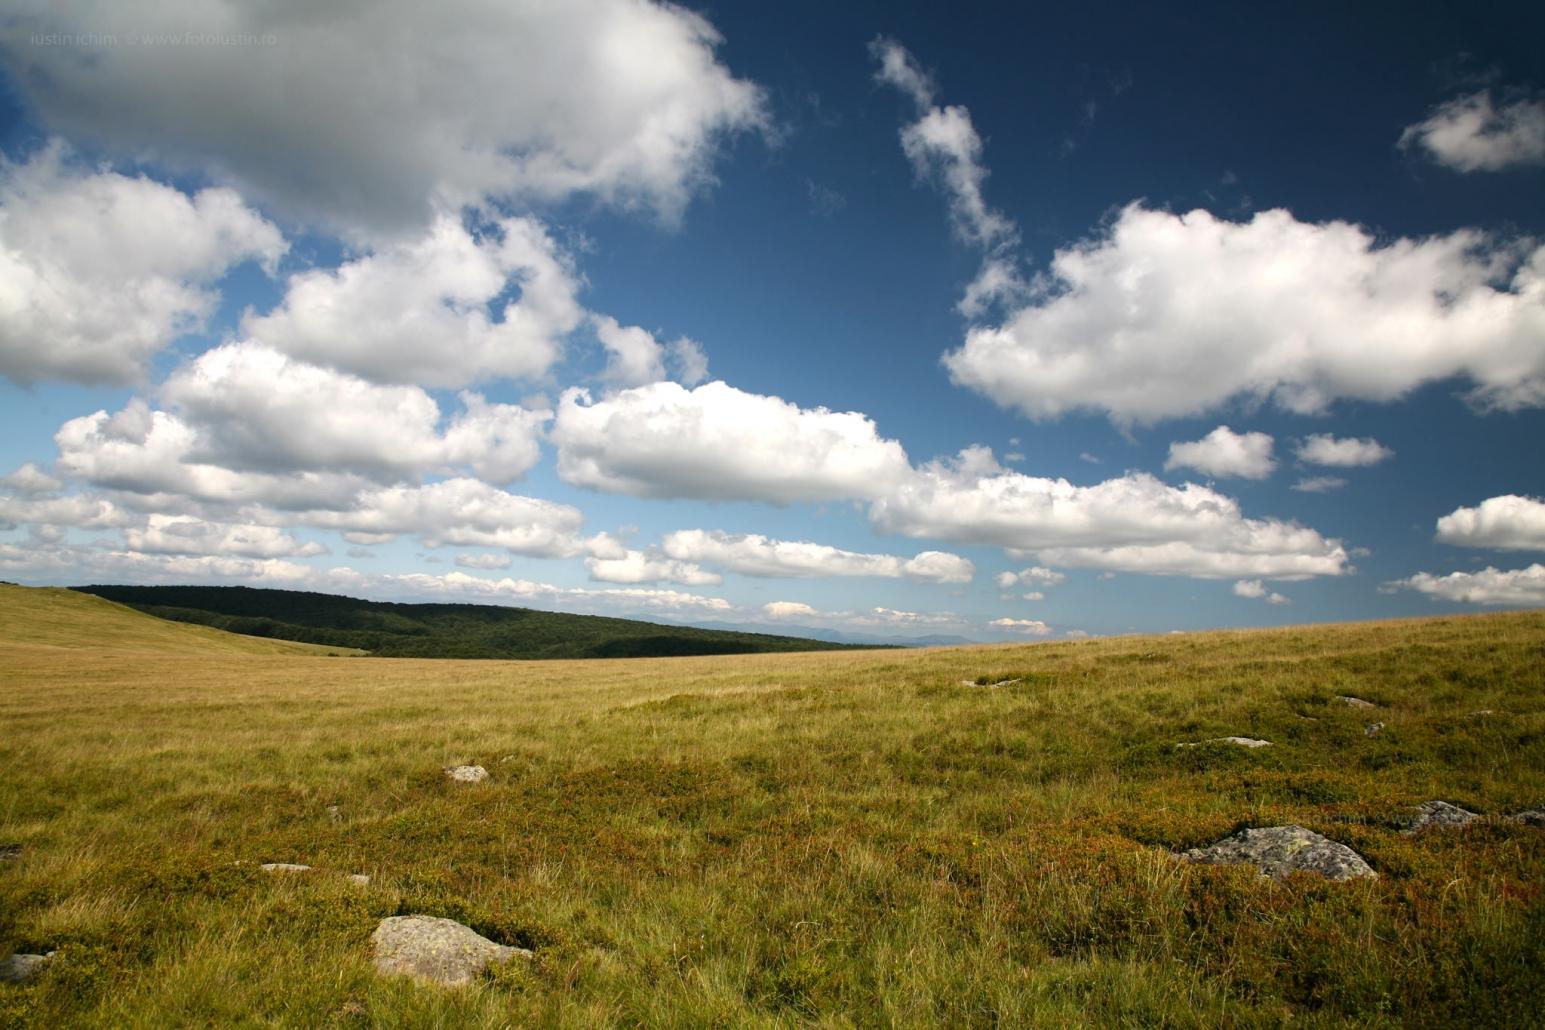 Peisaj din România, wallpaper cu nori